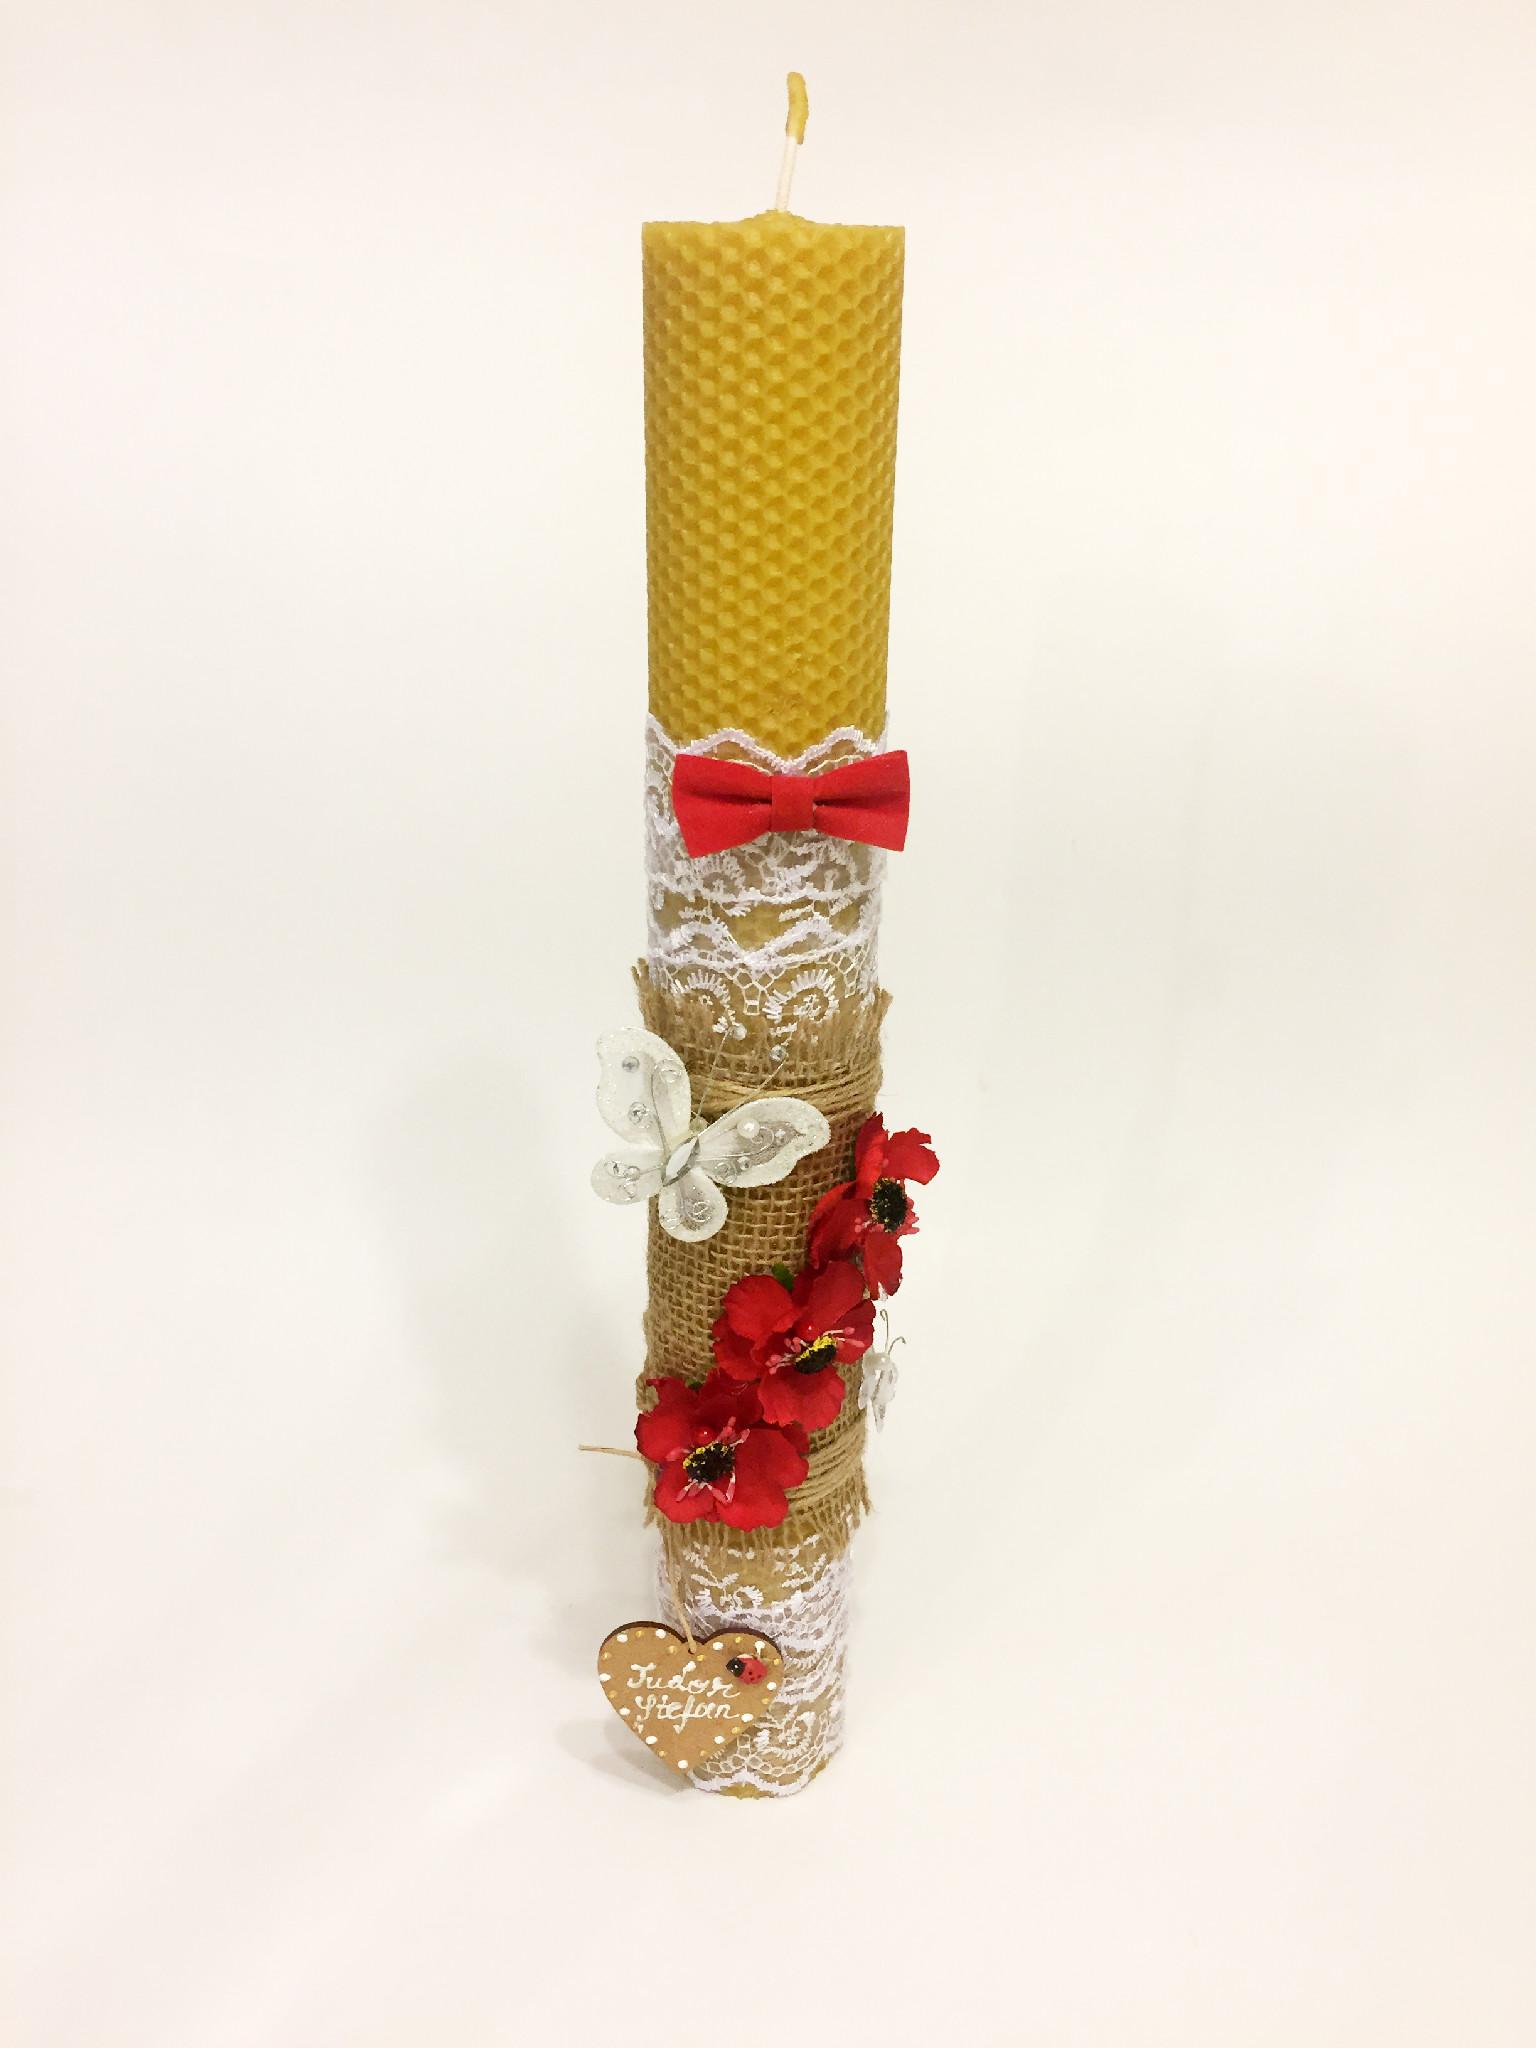 Lumanare Botez Decorata Cu Maci Rosii Bwx Candles